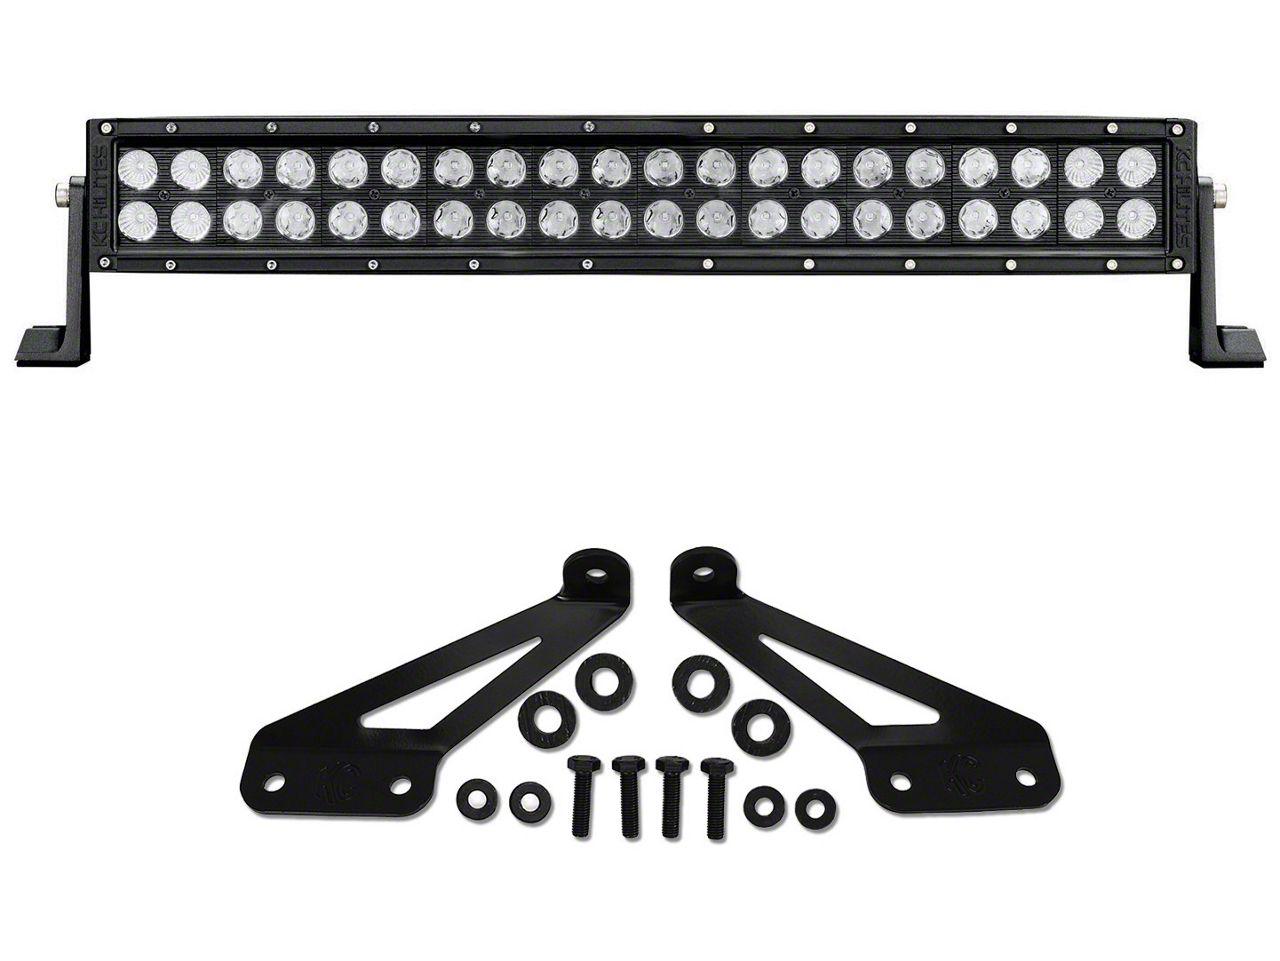 KC HiLiTES 20 in. C-Series C20 LED Light Bar w/ Hood Mounting Brackets (07-18 Jeep Wrangler JK; 2018 Jeep Wrangler JL)